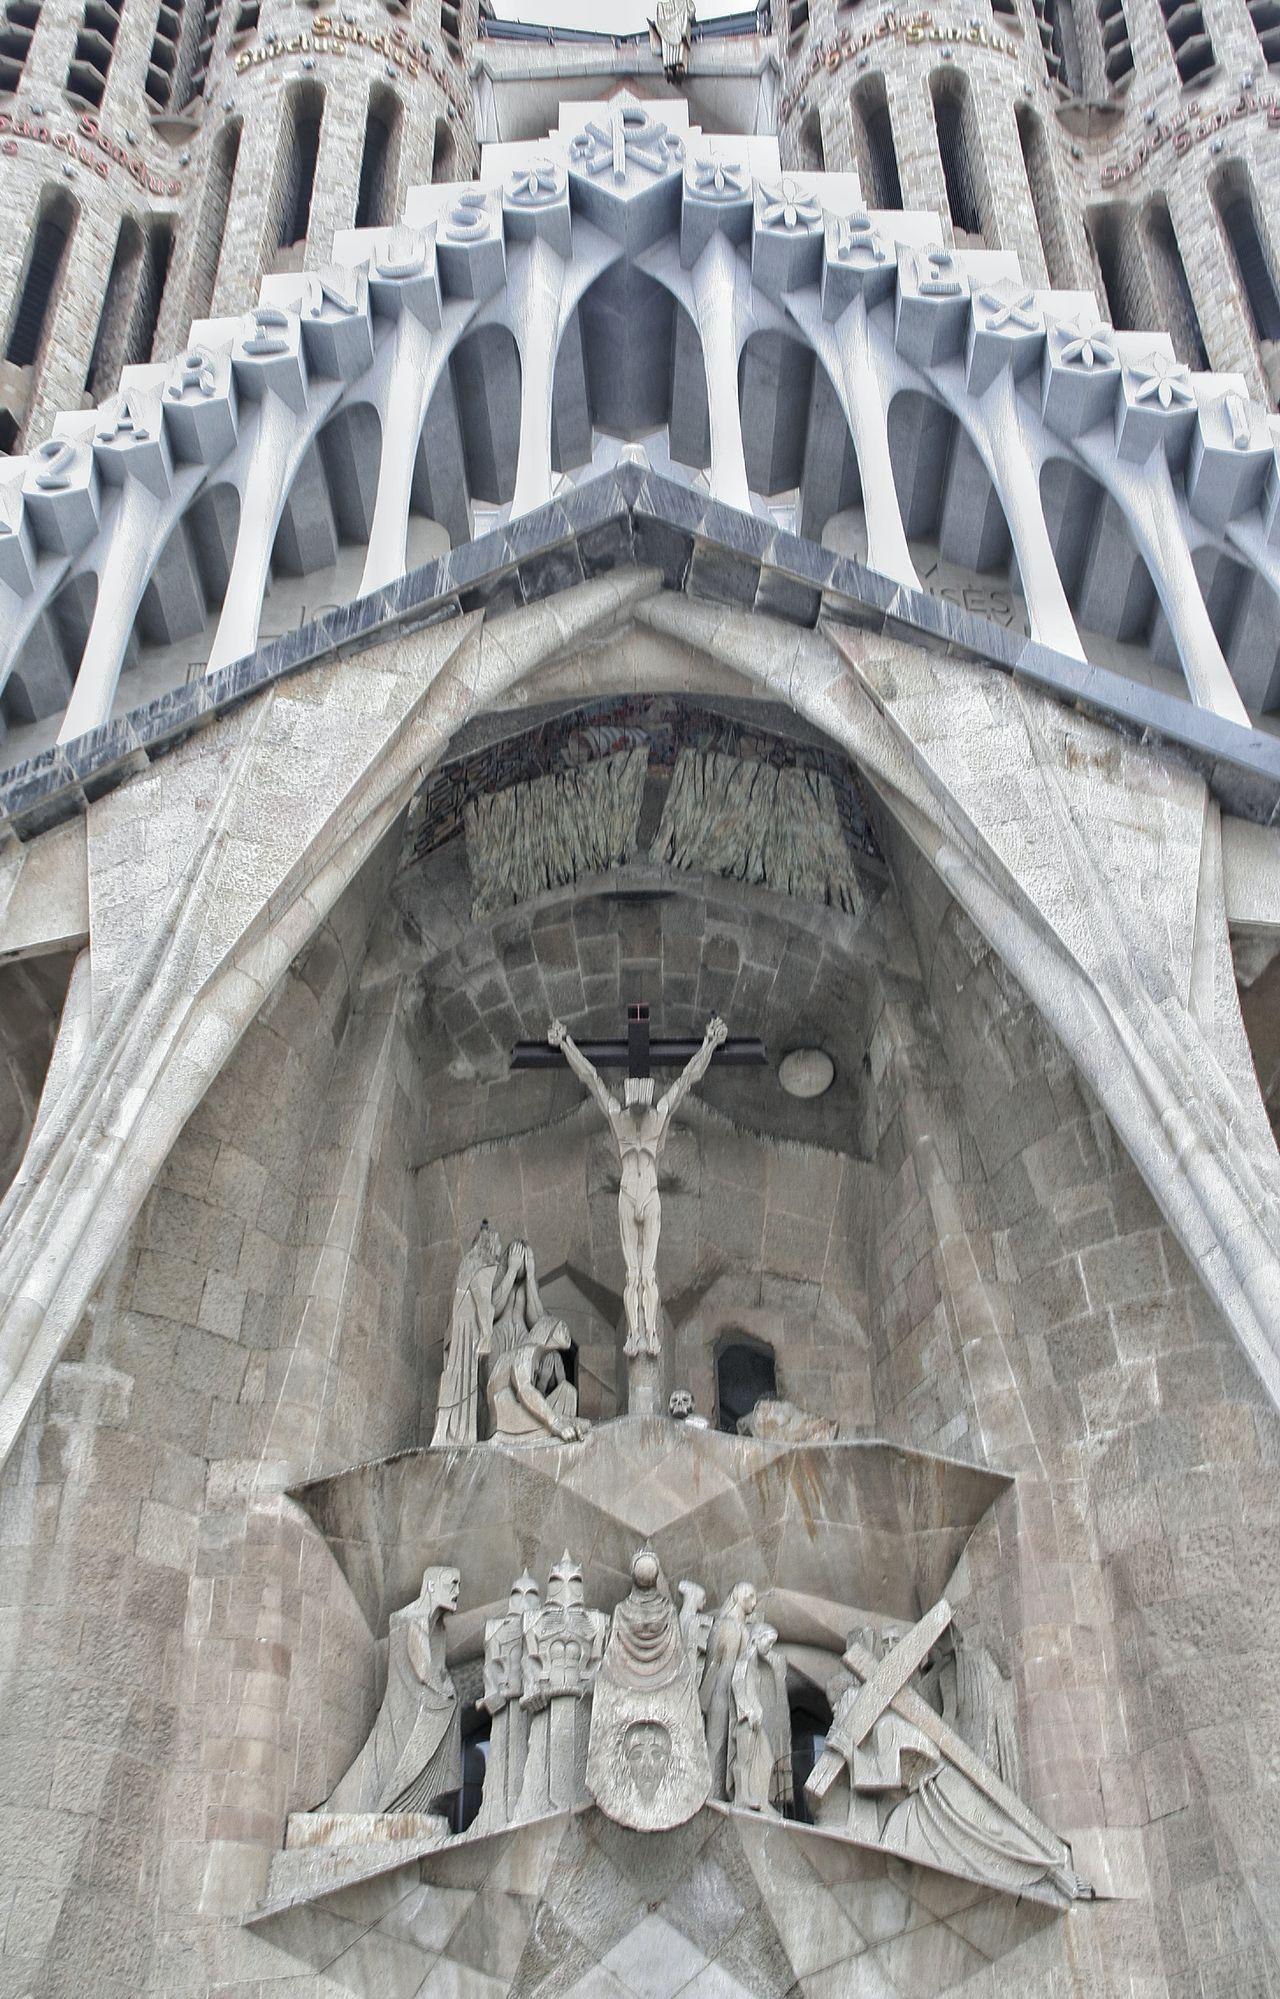 Sagradafamilia Barcelona Catalonia Catalunya Architecture And Art Architectural Detail Architecture Architecture Photography Church Architecture Church EyeEm Best Shots Travel Destinations Travel Gaudi Gaudì Architecture Work Gaudi Barcelona EyeEmNewHere